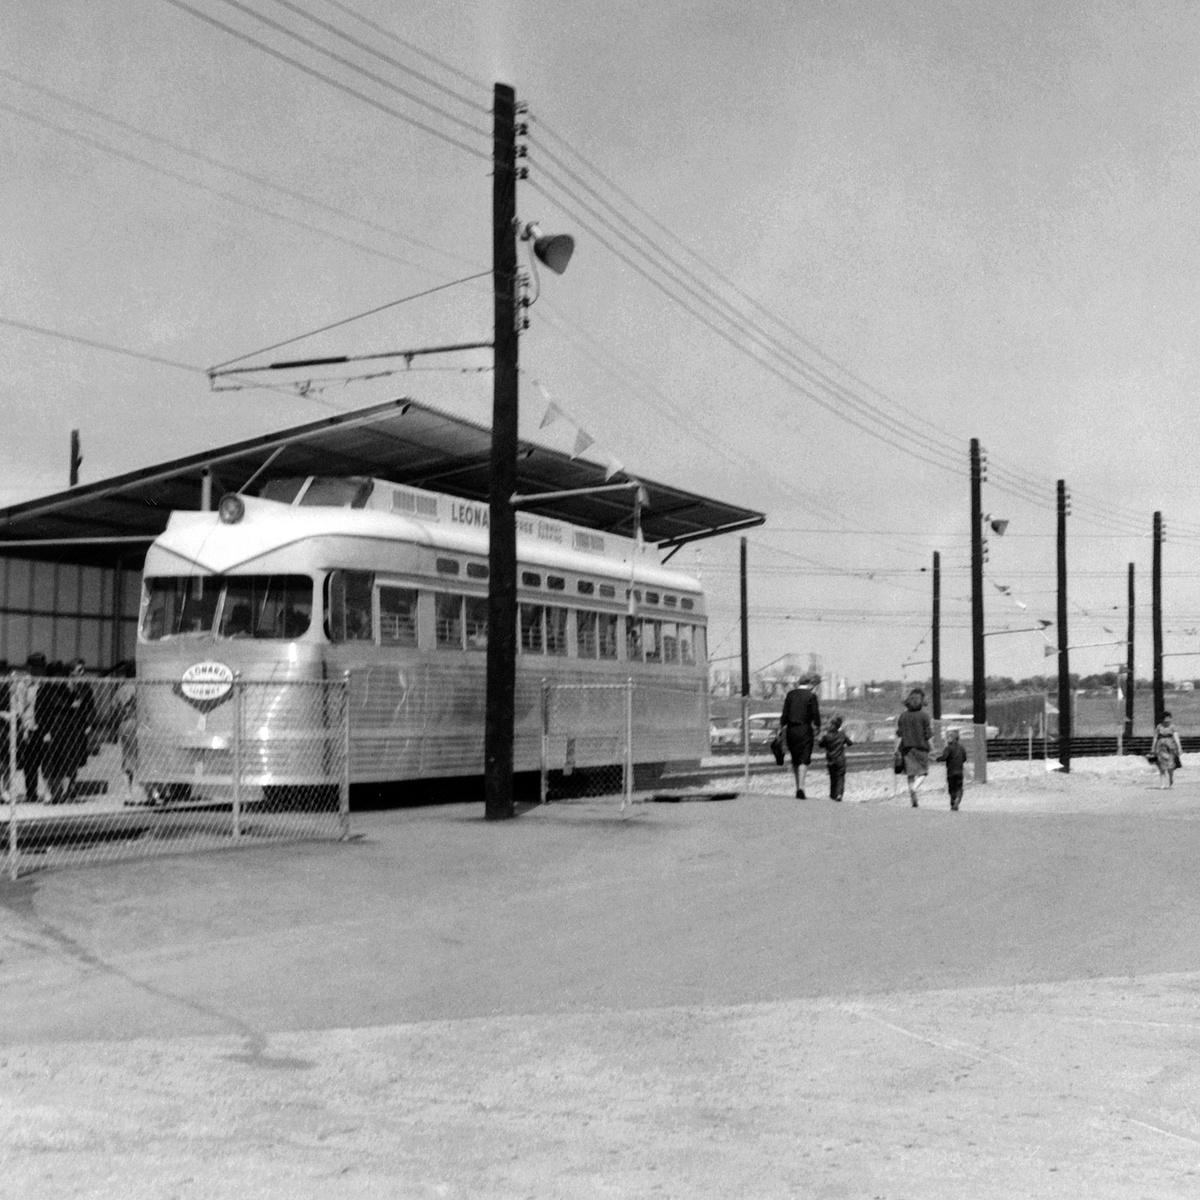 (497k, 1200x1200)<br><b>Country:</b> United States<br><b>City:</b> Fort Worth, TX<br><b>System:</b> Tandy Subway<br><b>Collection of:</b> David Pirmann<br><b>Date:</b> 4/1963<br><b>Notes:</b> Leonards Subway PCC cars<br><b>Viewed (this week/total):</b> 2 / 38